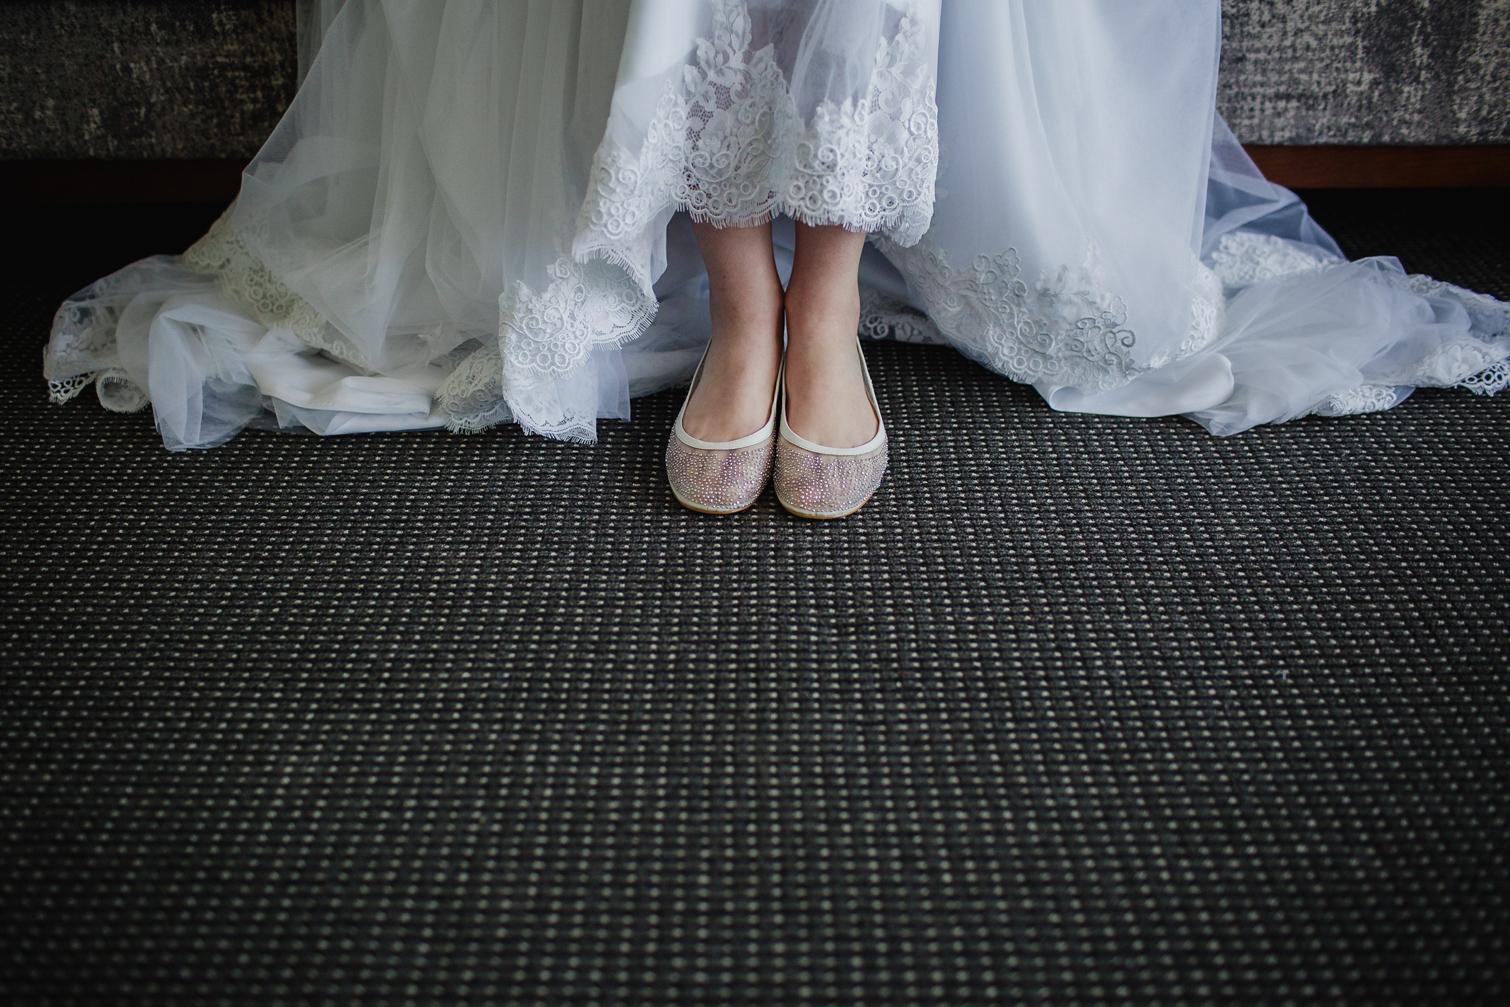 Boomerang_Farm_Gold_Coast_Wedding_Photography-50.jpg